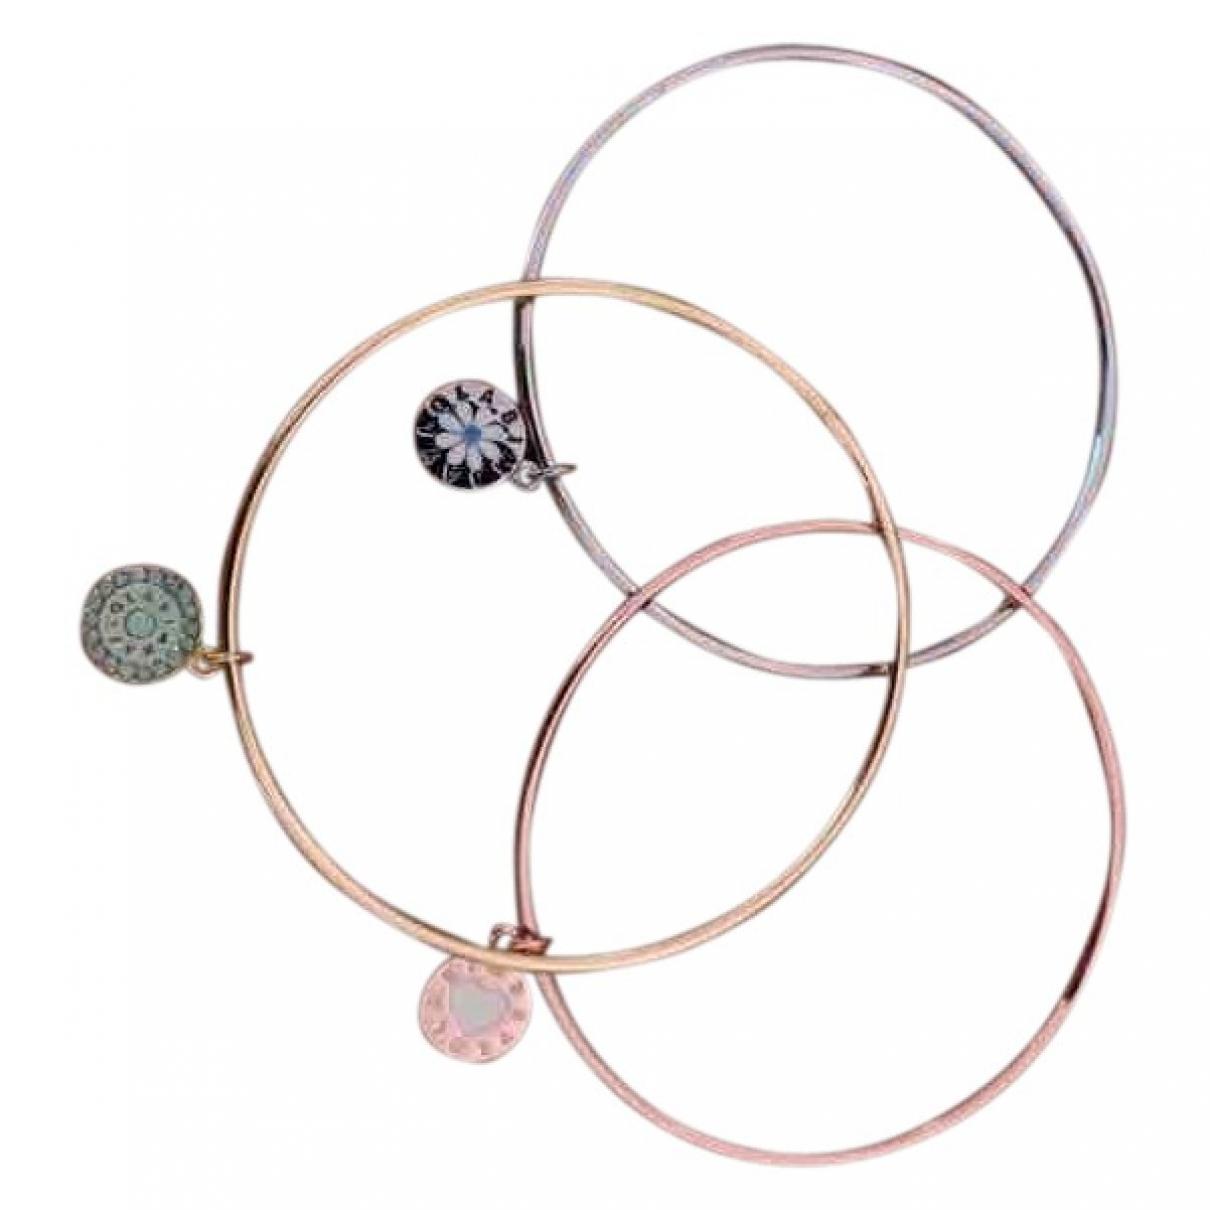 Bimba Y Lola \N Gold Metal bracelet for Women \N